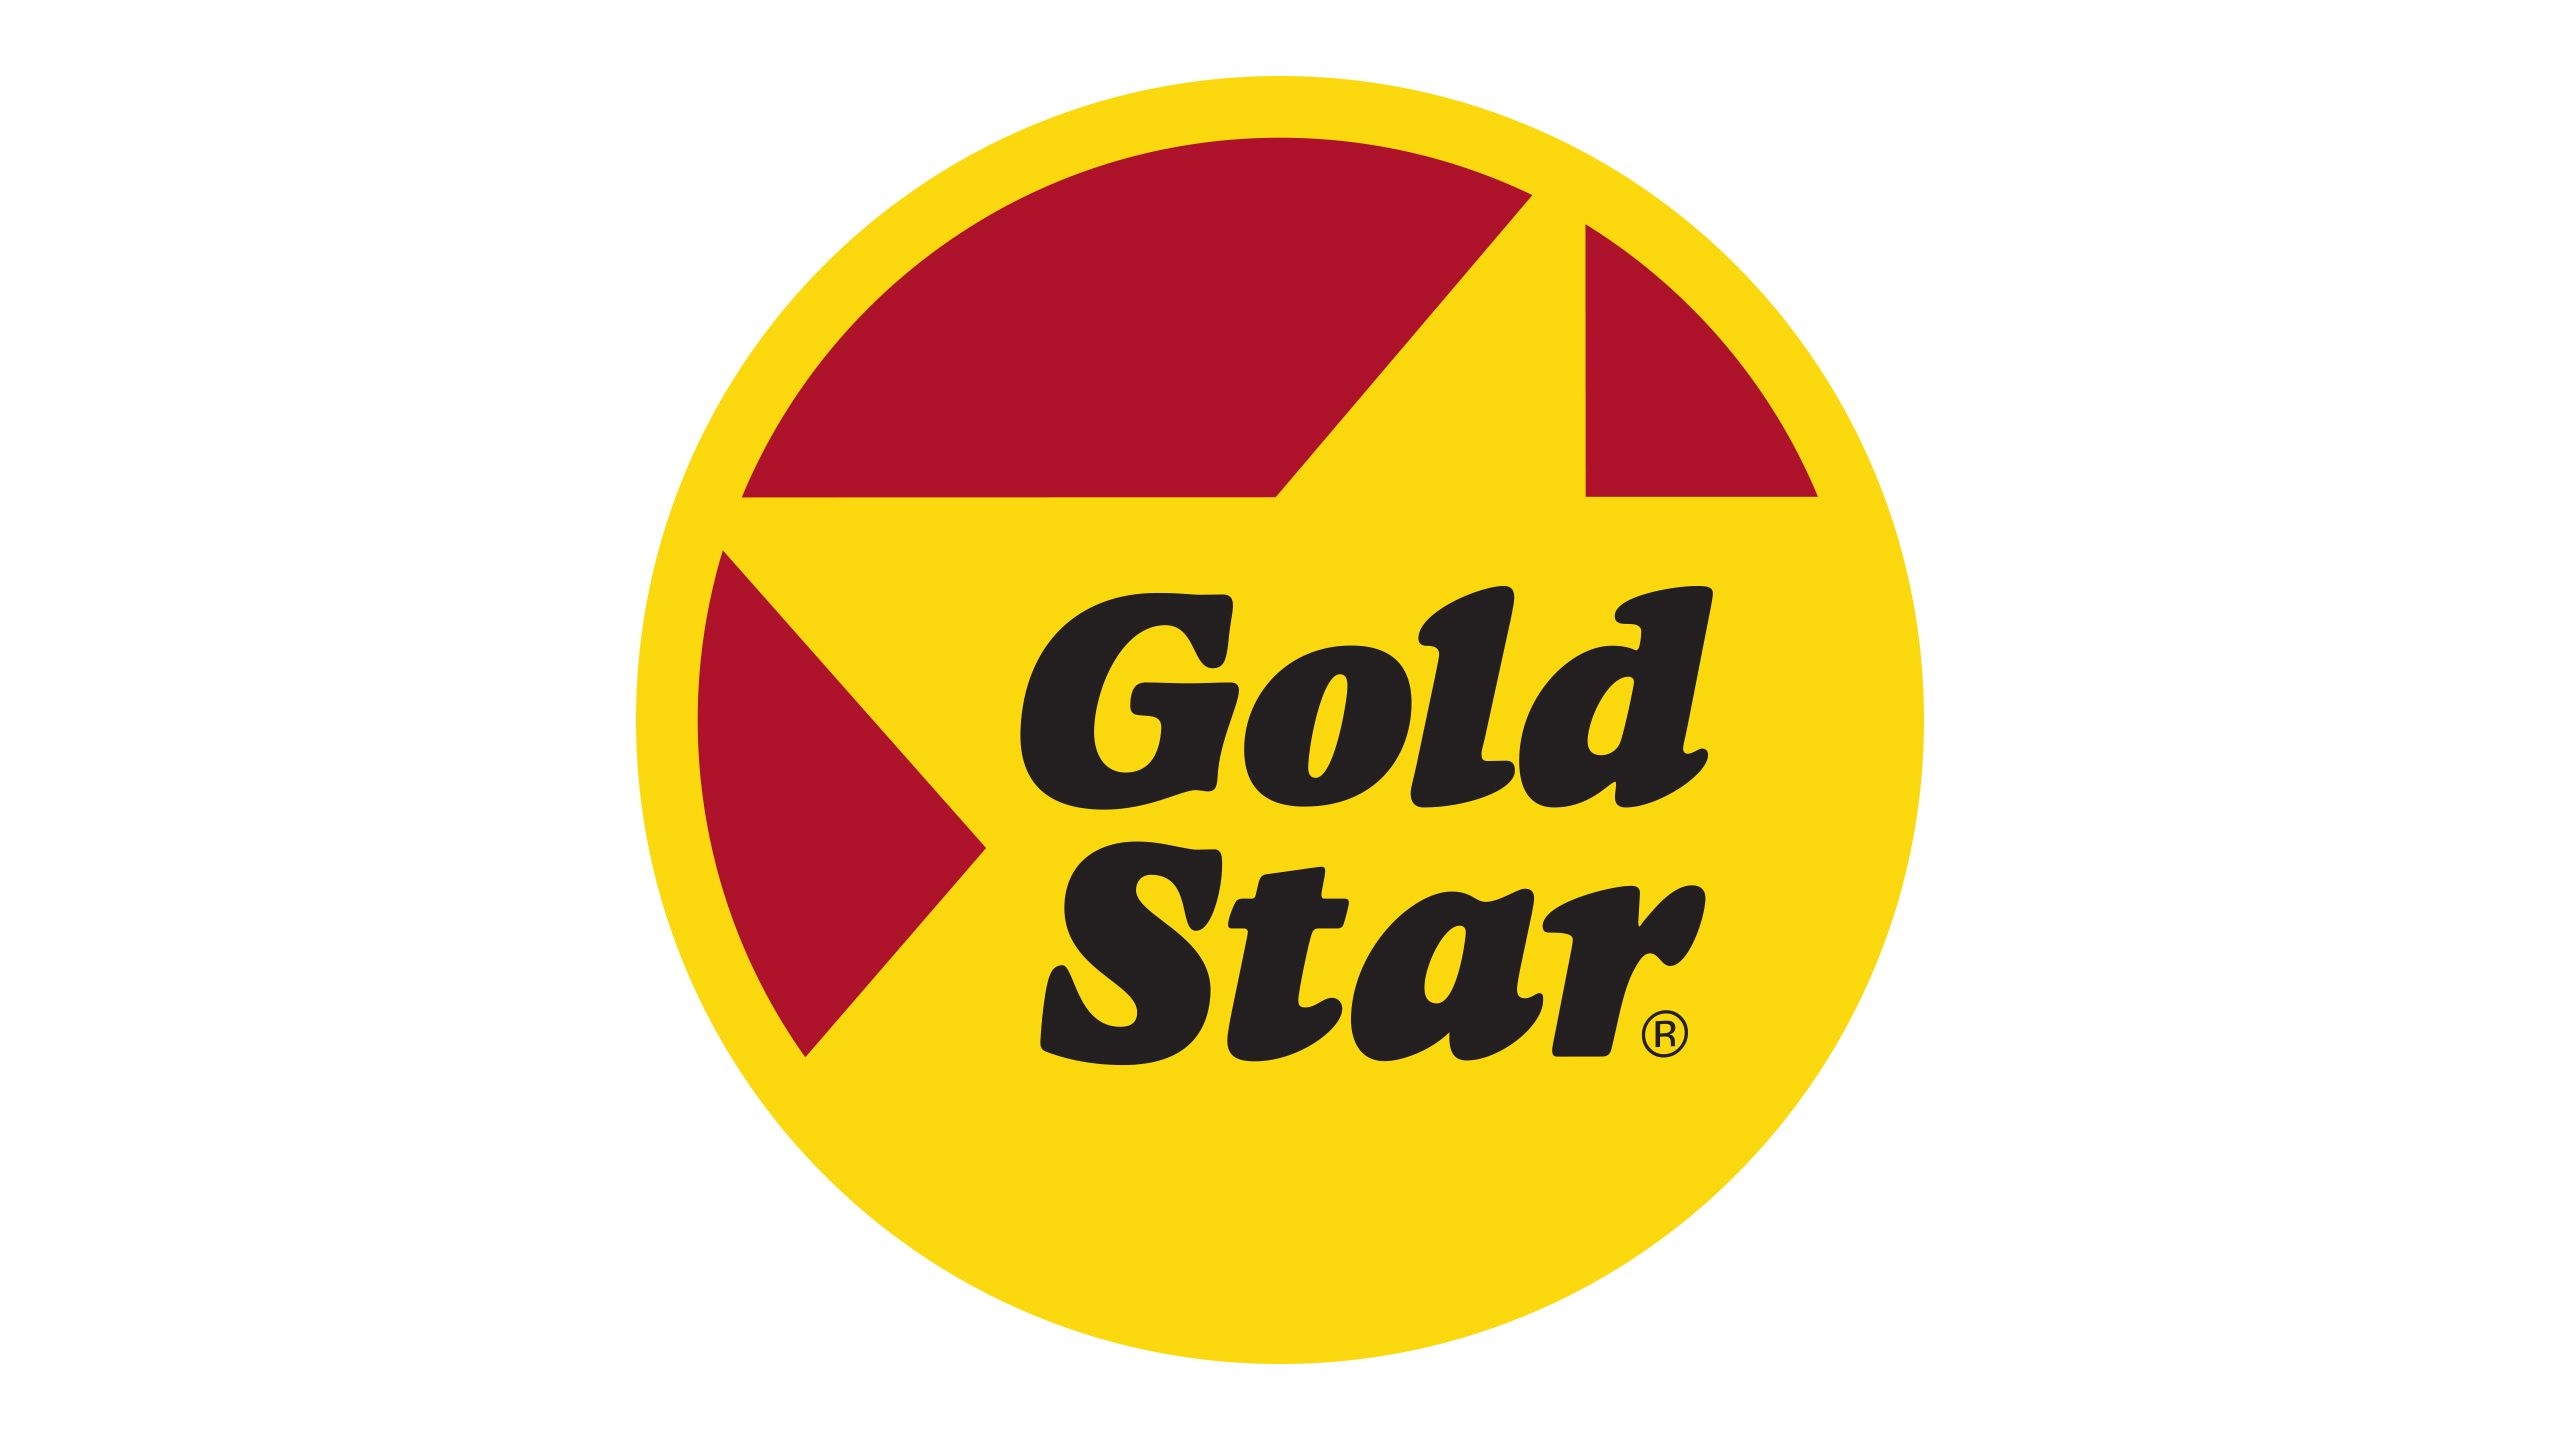 Gold Star Bogo 3-Way